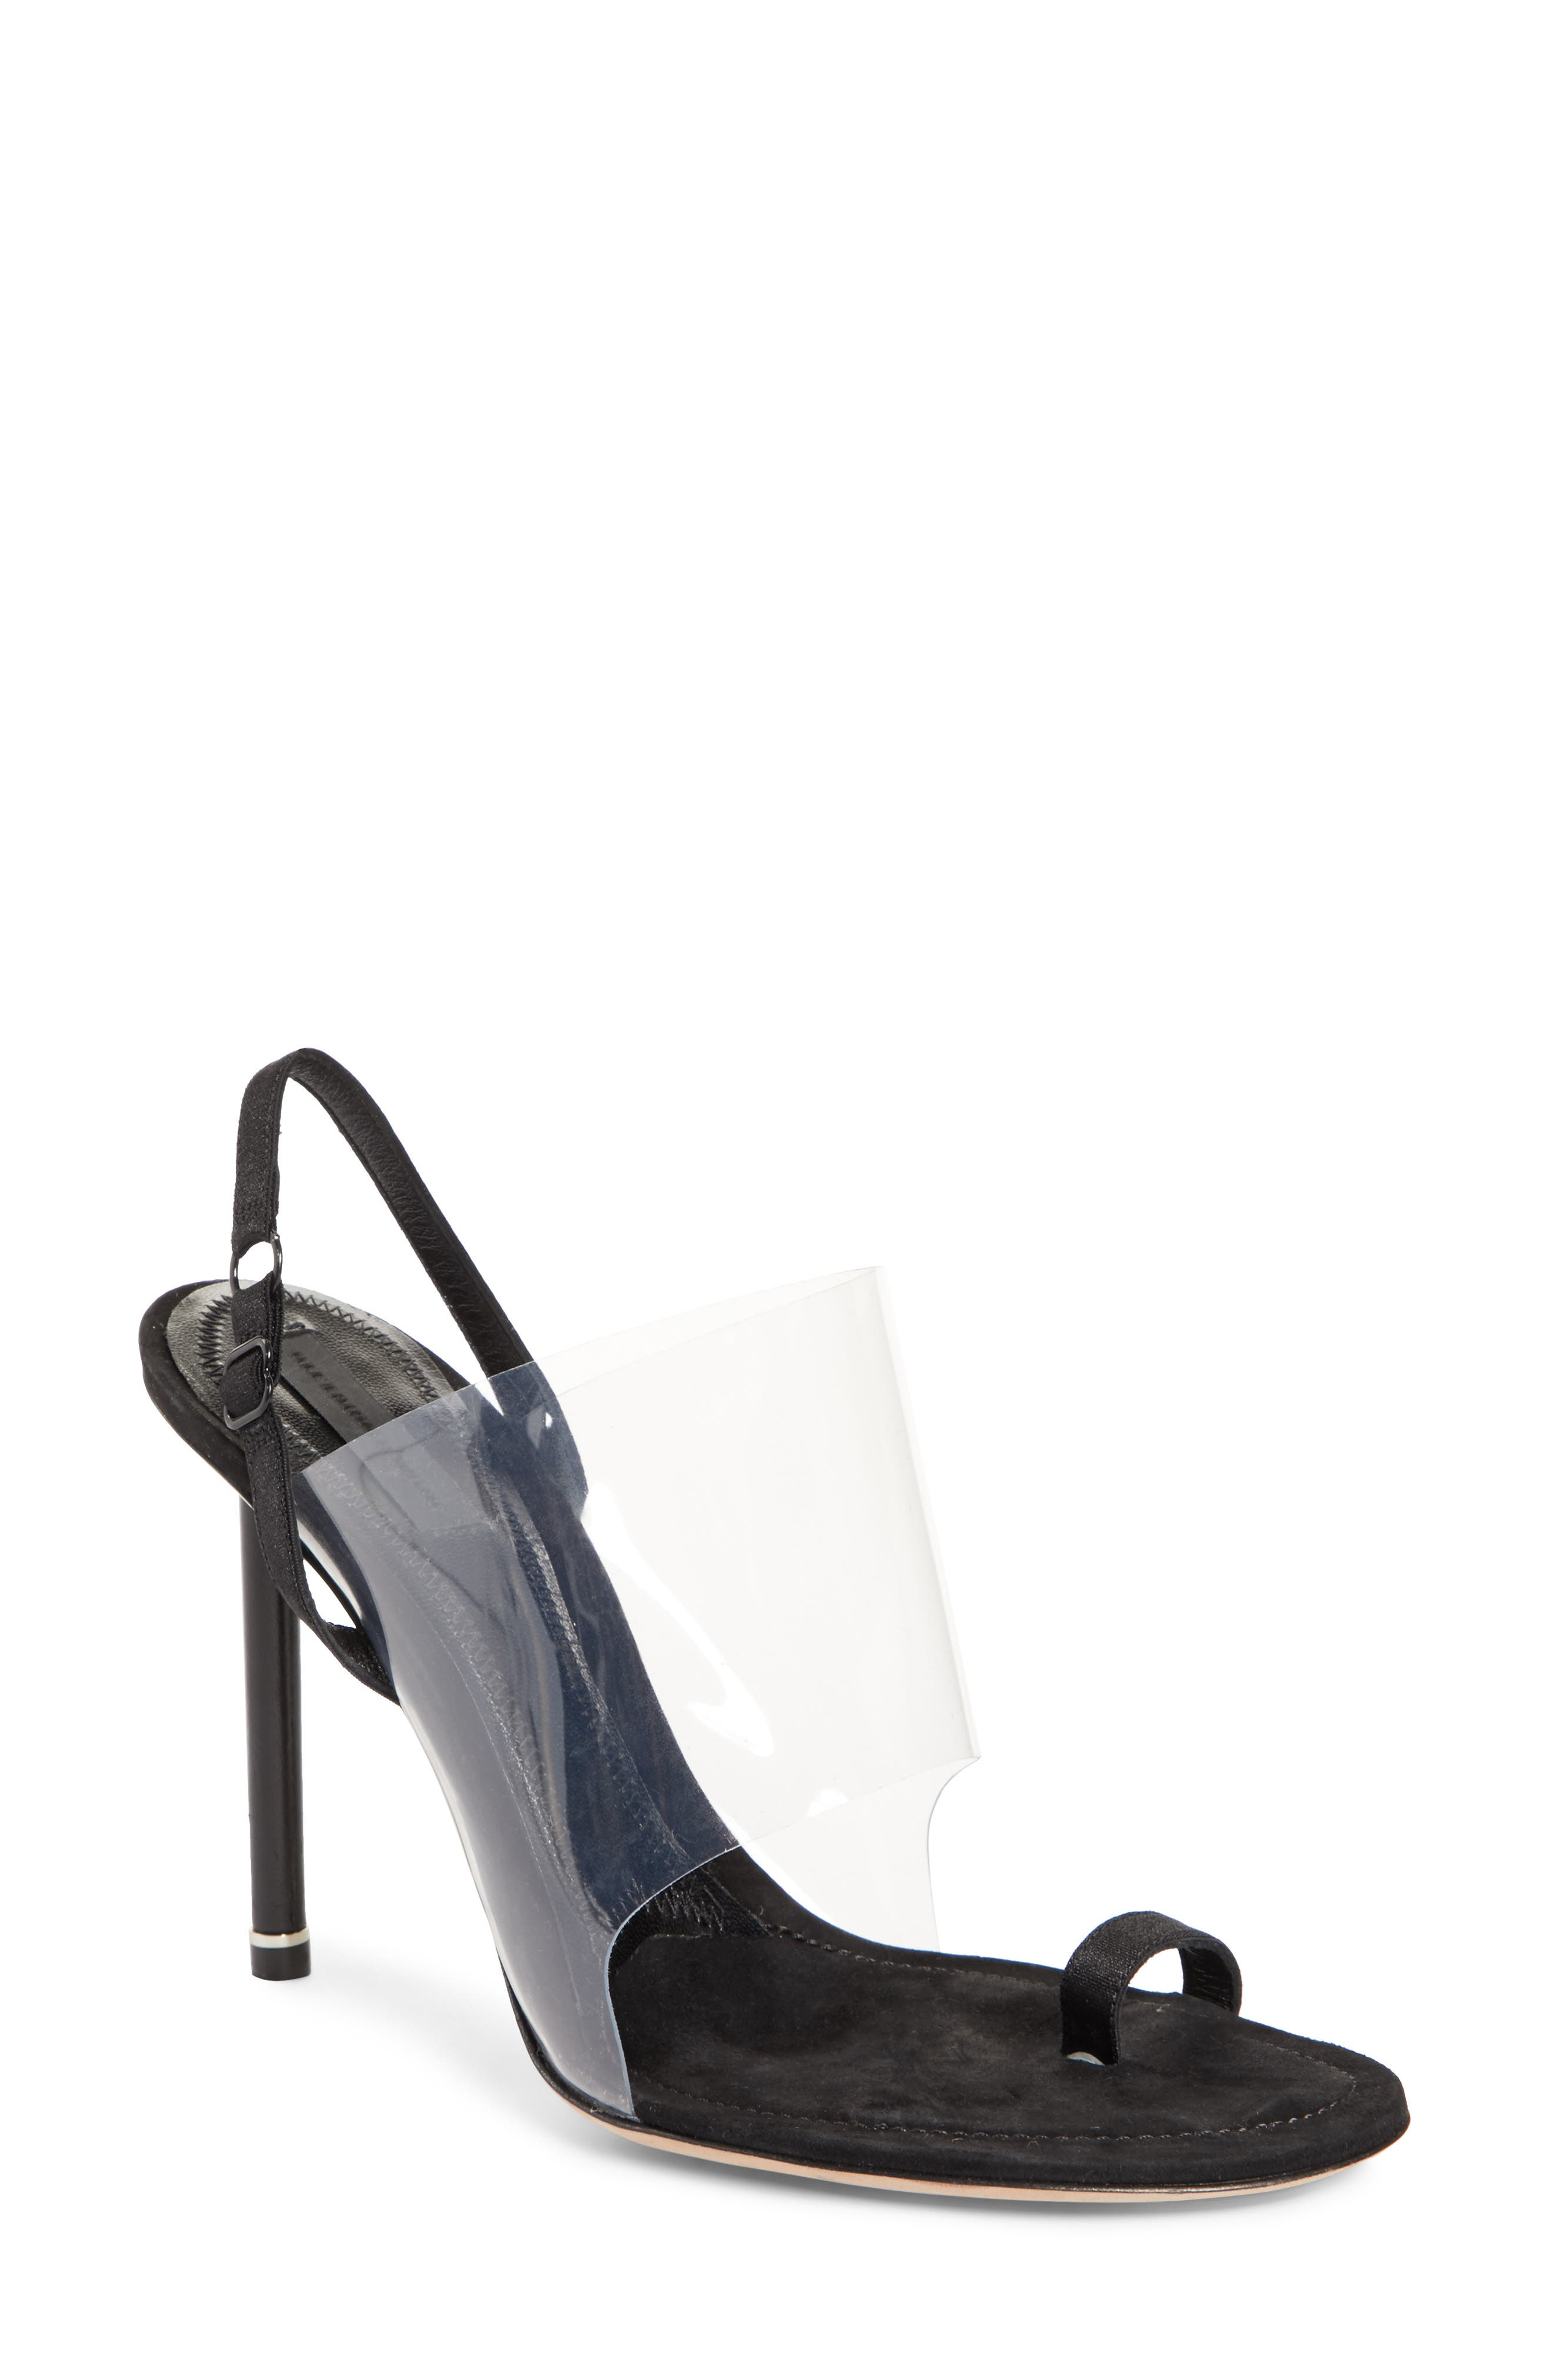 Kaia Sandal,                         Main,                         color, Black